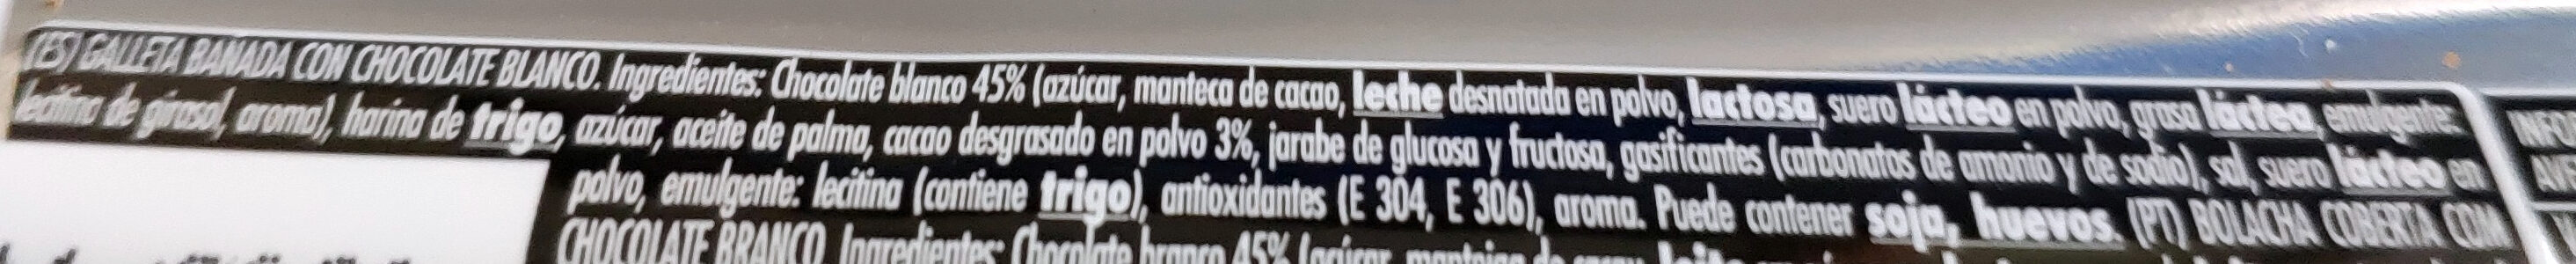 Filipinos chocolate blanco - Ingredients - es